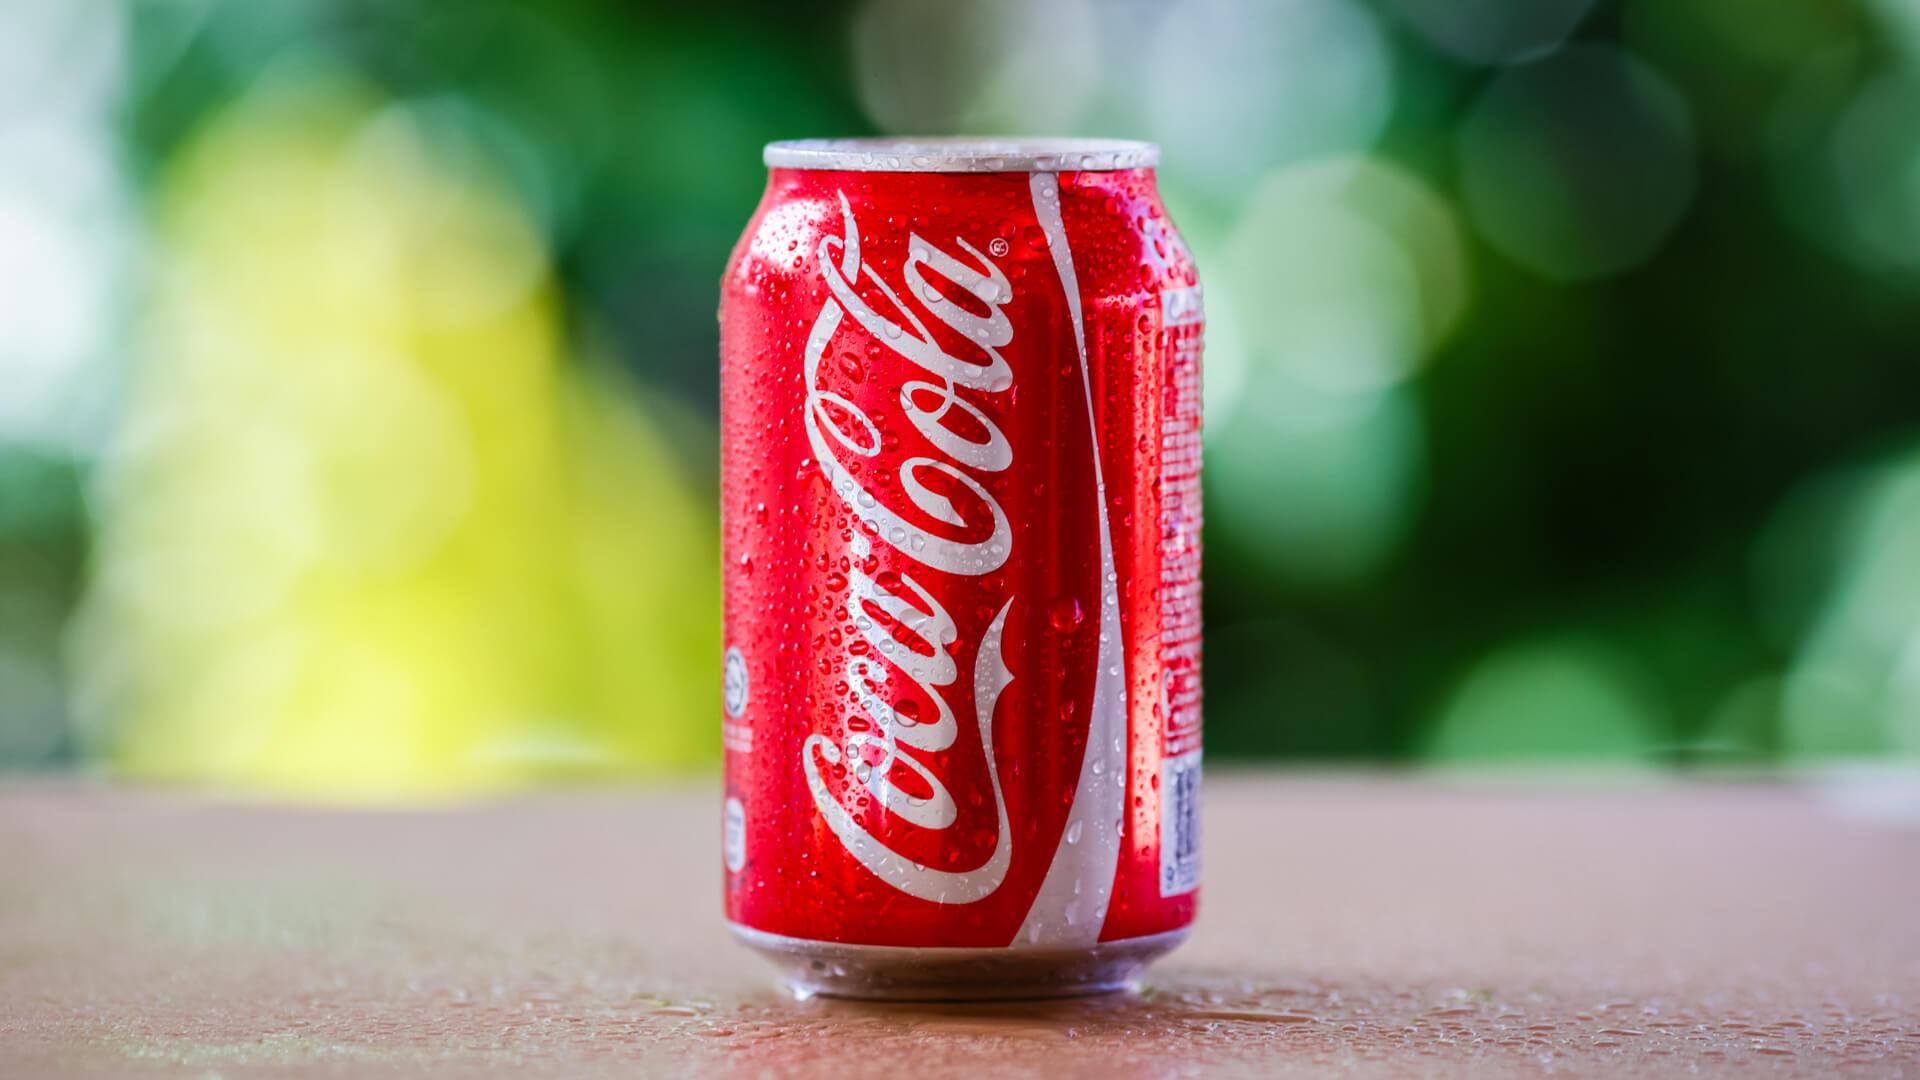 Walmart, Coca-Cola Plan Price Hikes Due to Tariffs